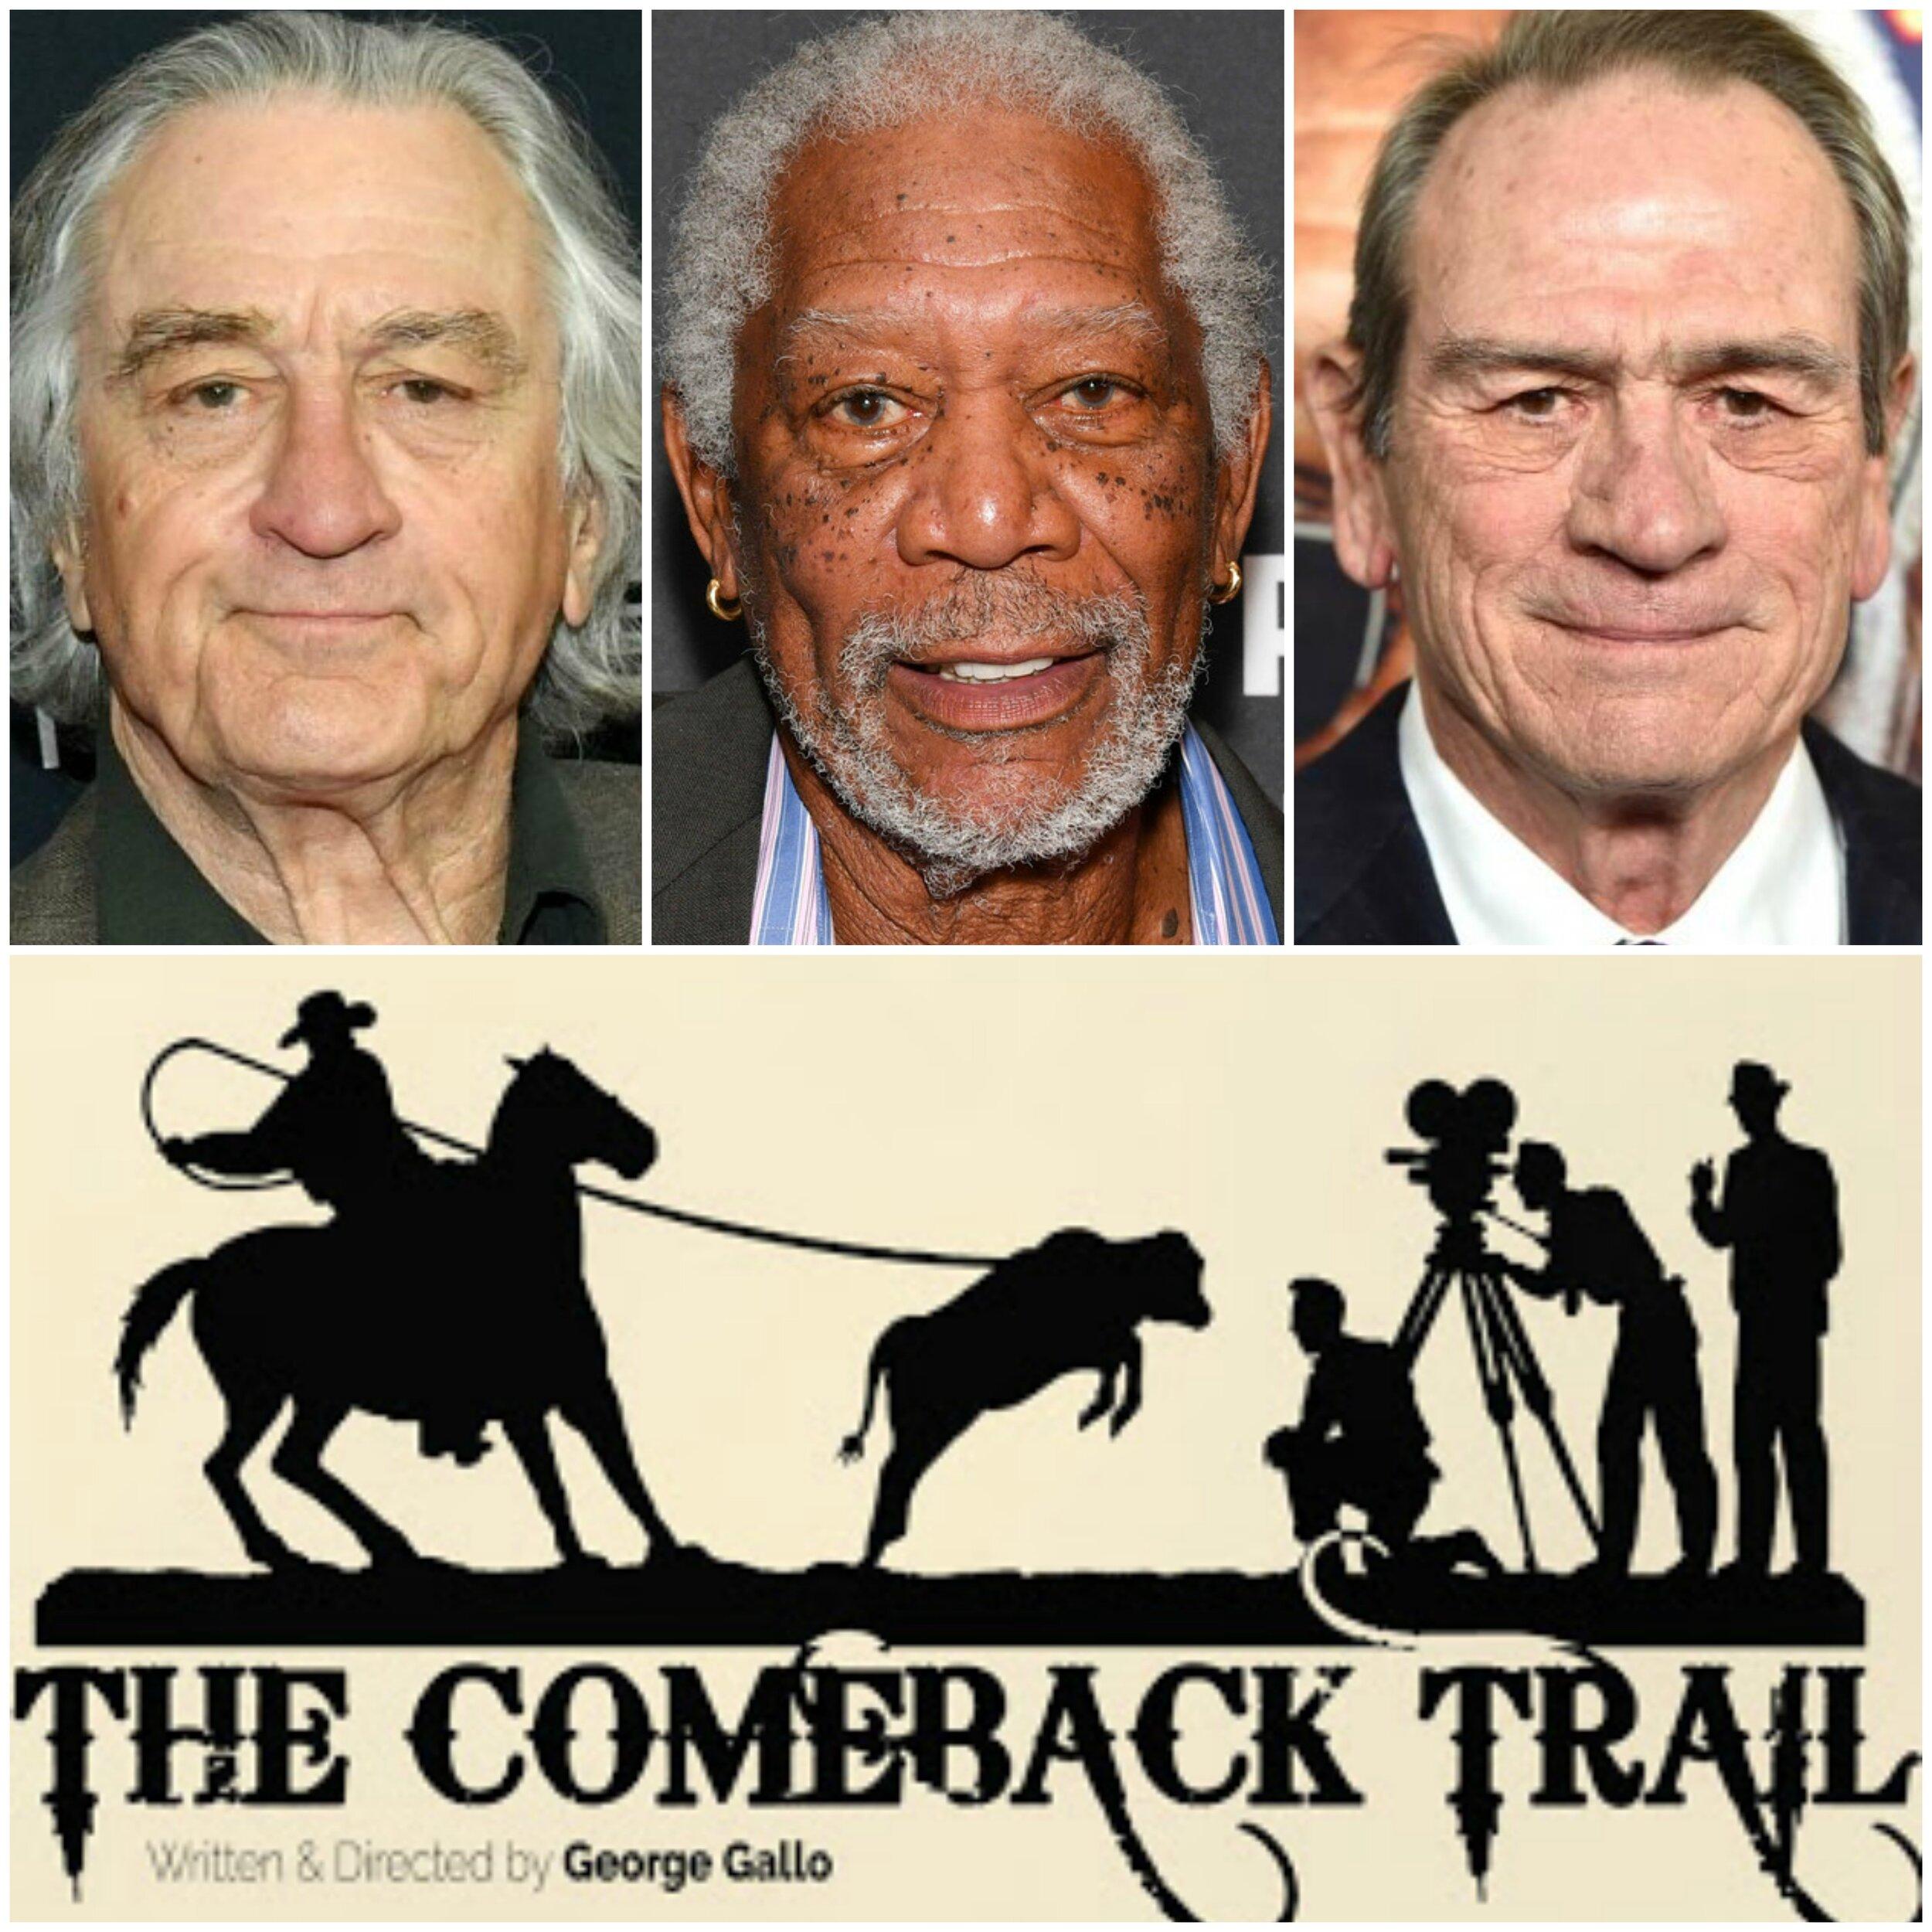 Trailer For The Comeback Trail Starring Robert De Niro Morgan Freeman And Tommy Lee Jones Blackfilmandtv Com